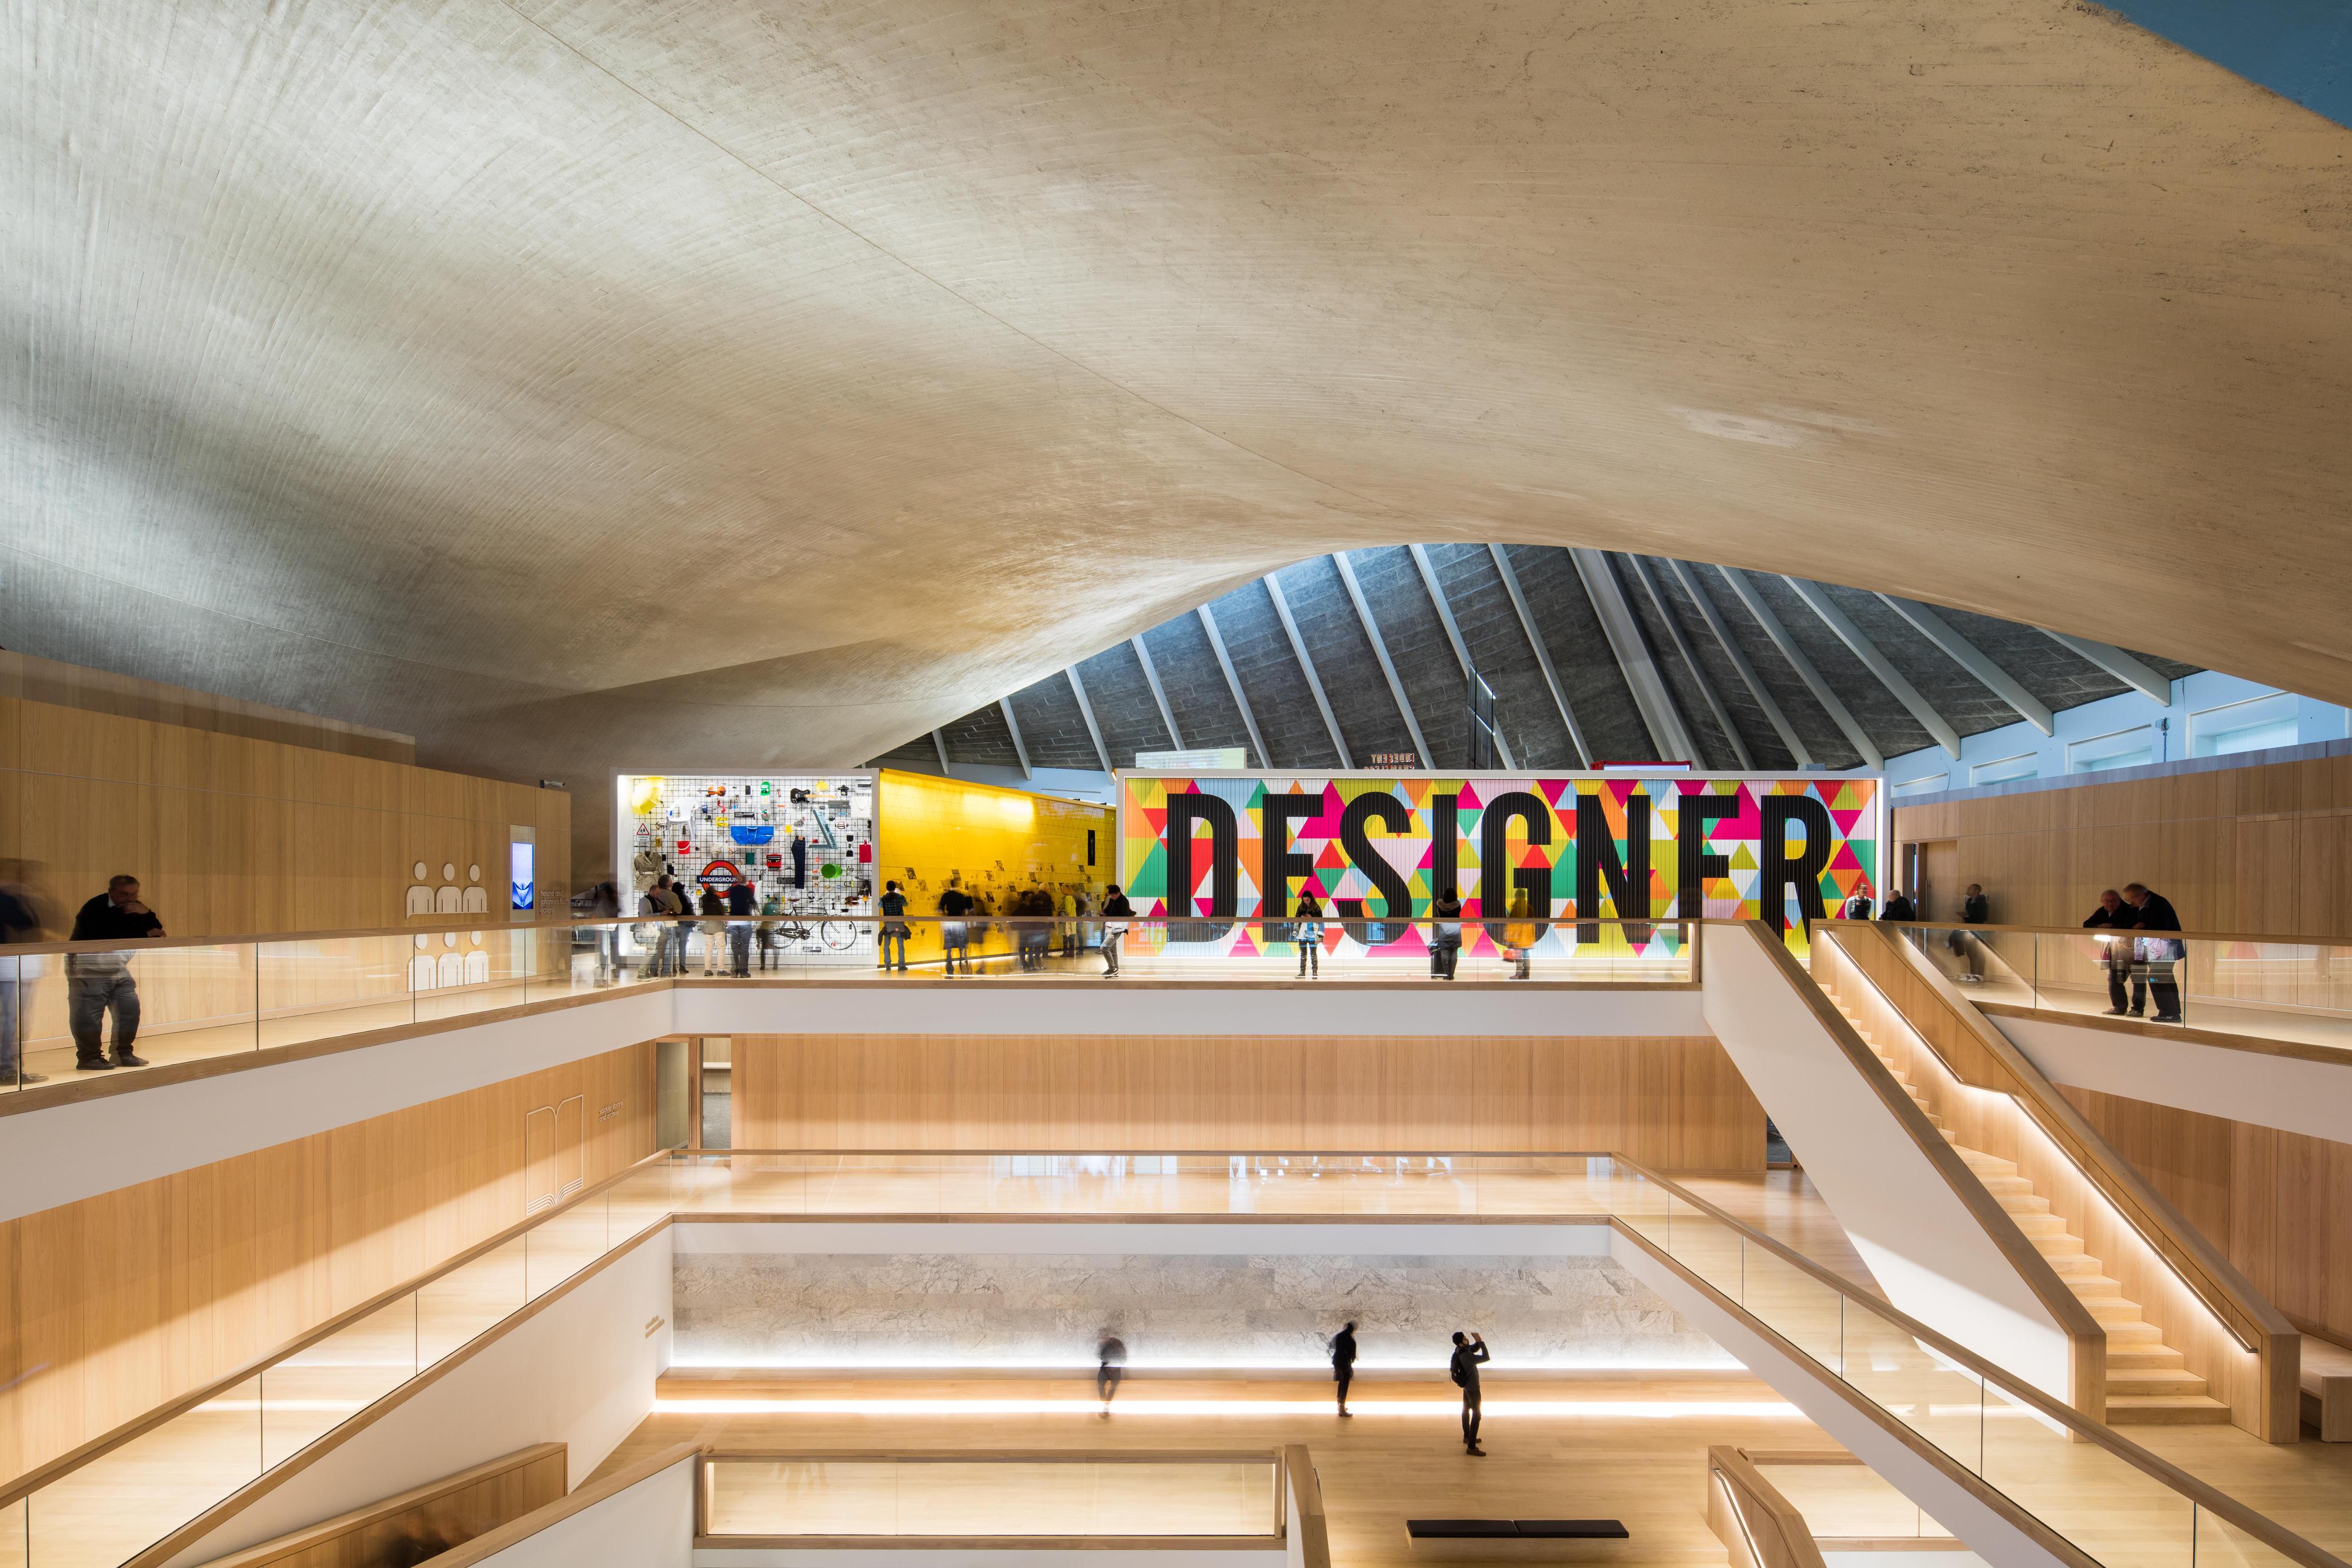 161124-Design-Museum-Luke-Hayes208 (1).jpg